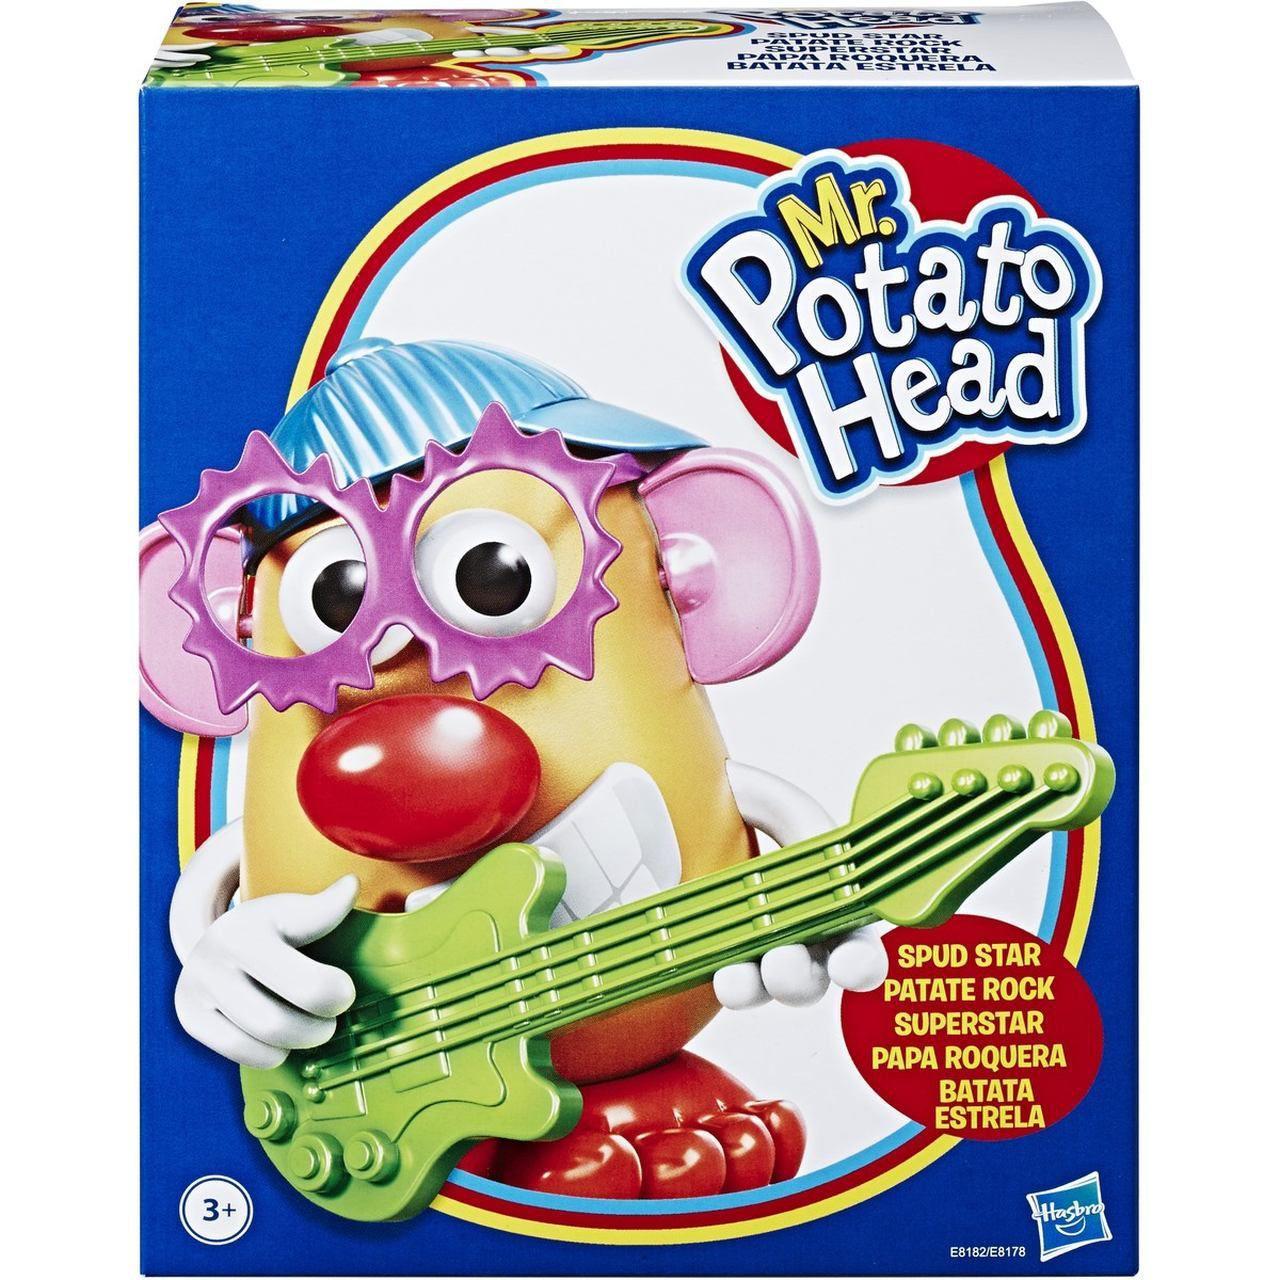 Boneco Sr Cabeça De Batata Rock Star - Hasbro E8178